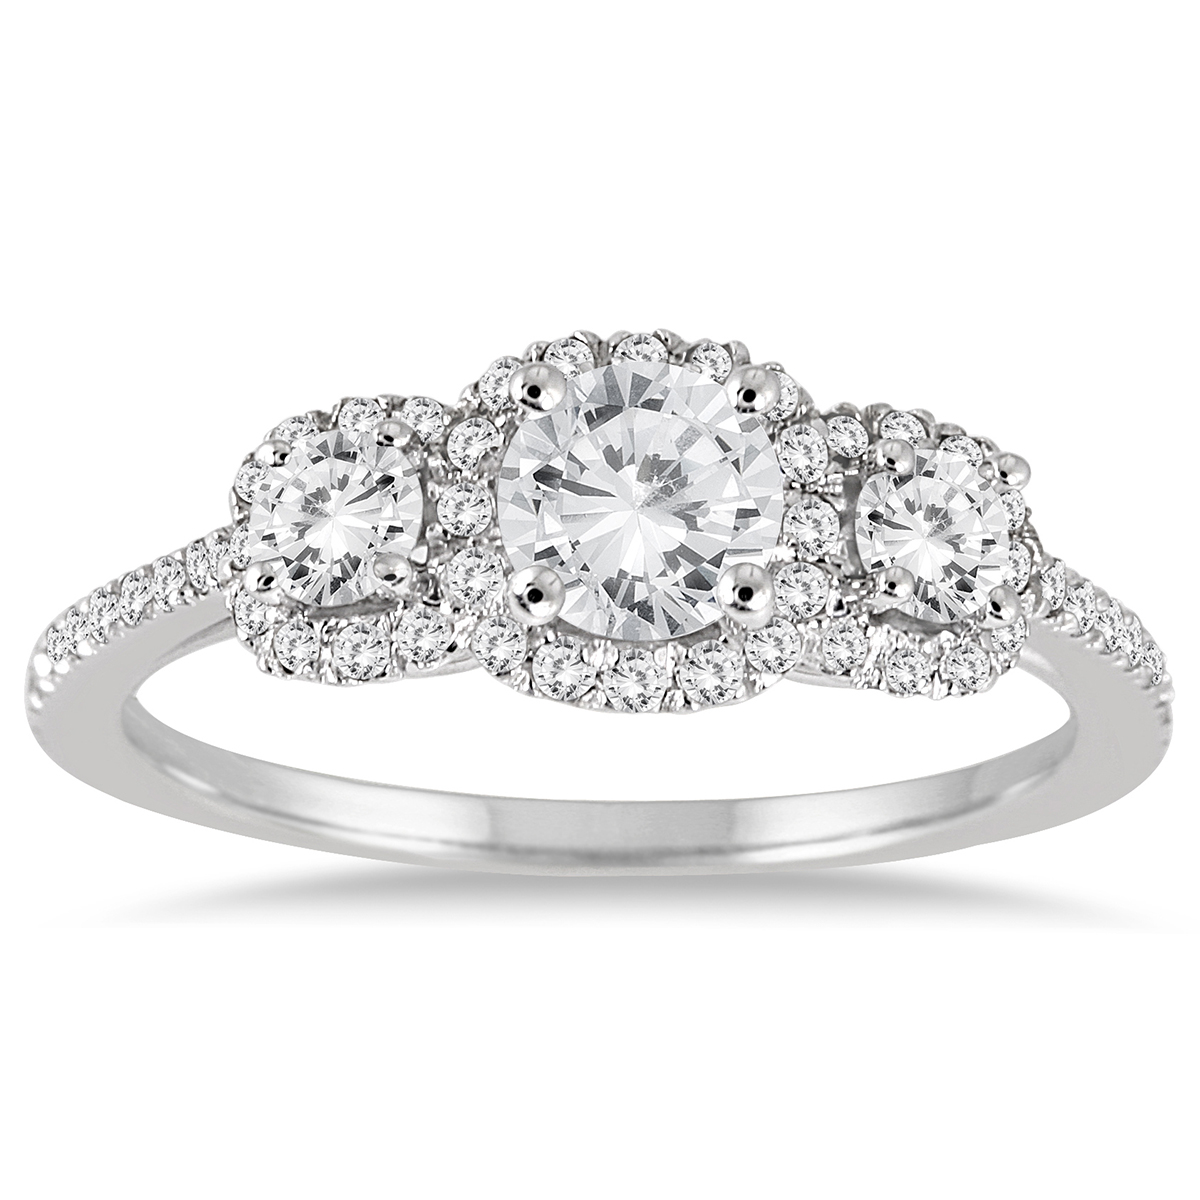 1 Carat TW Diamond Three Stone Ring